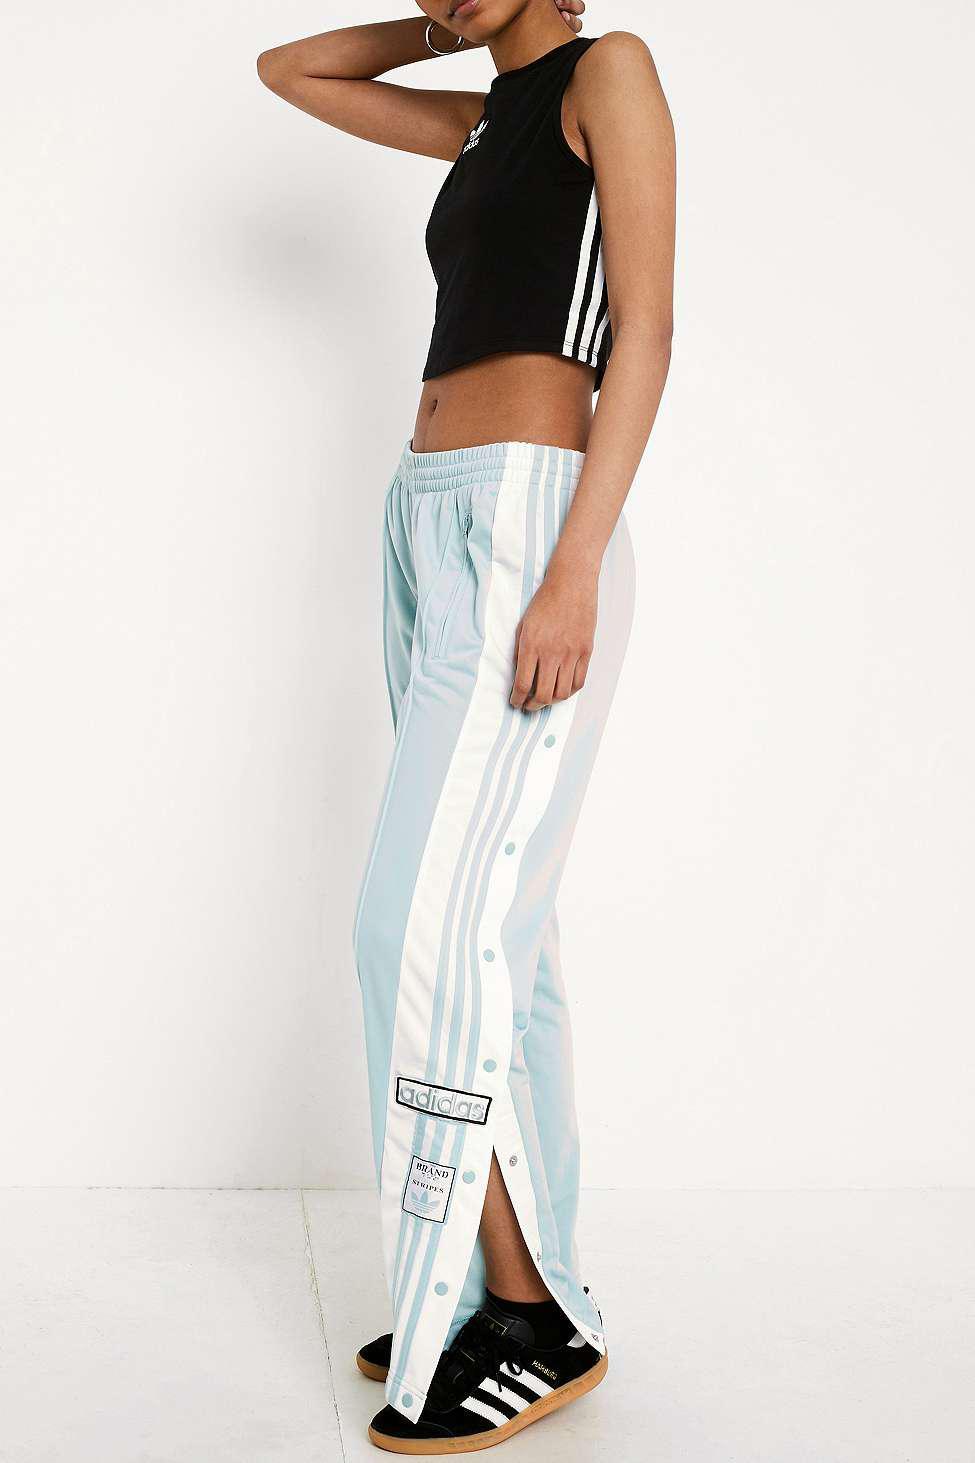 5db0089e73a1 adidas Originals Adibreak Mint 3-stripe Black Taped Popper Track ...